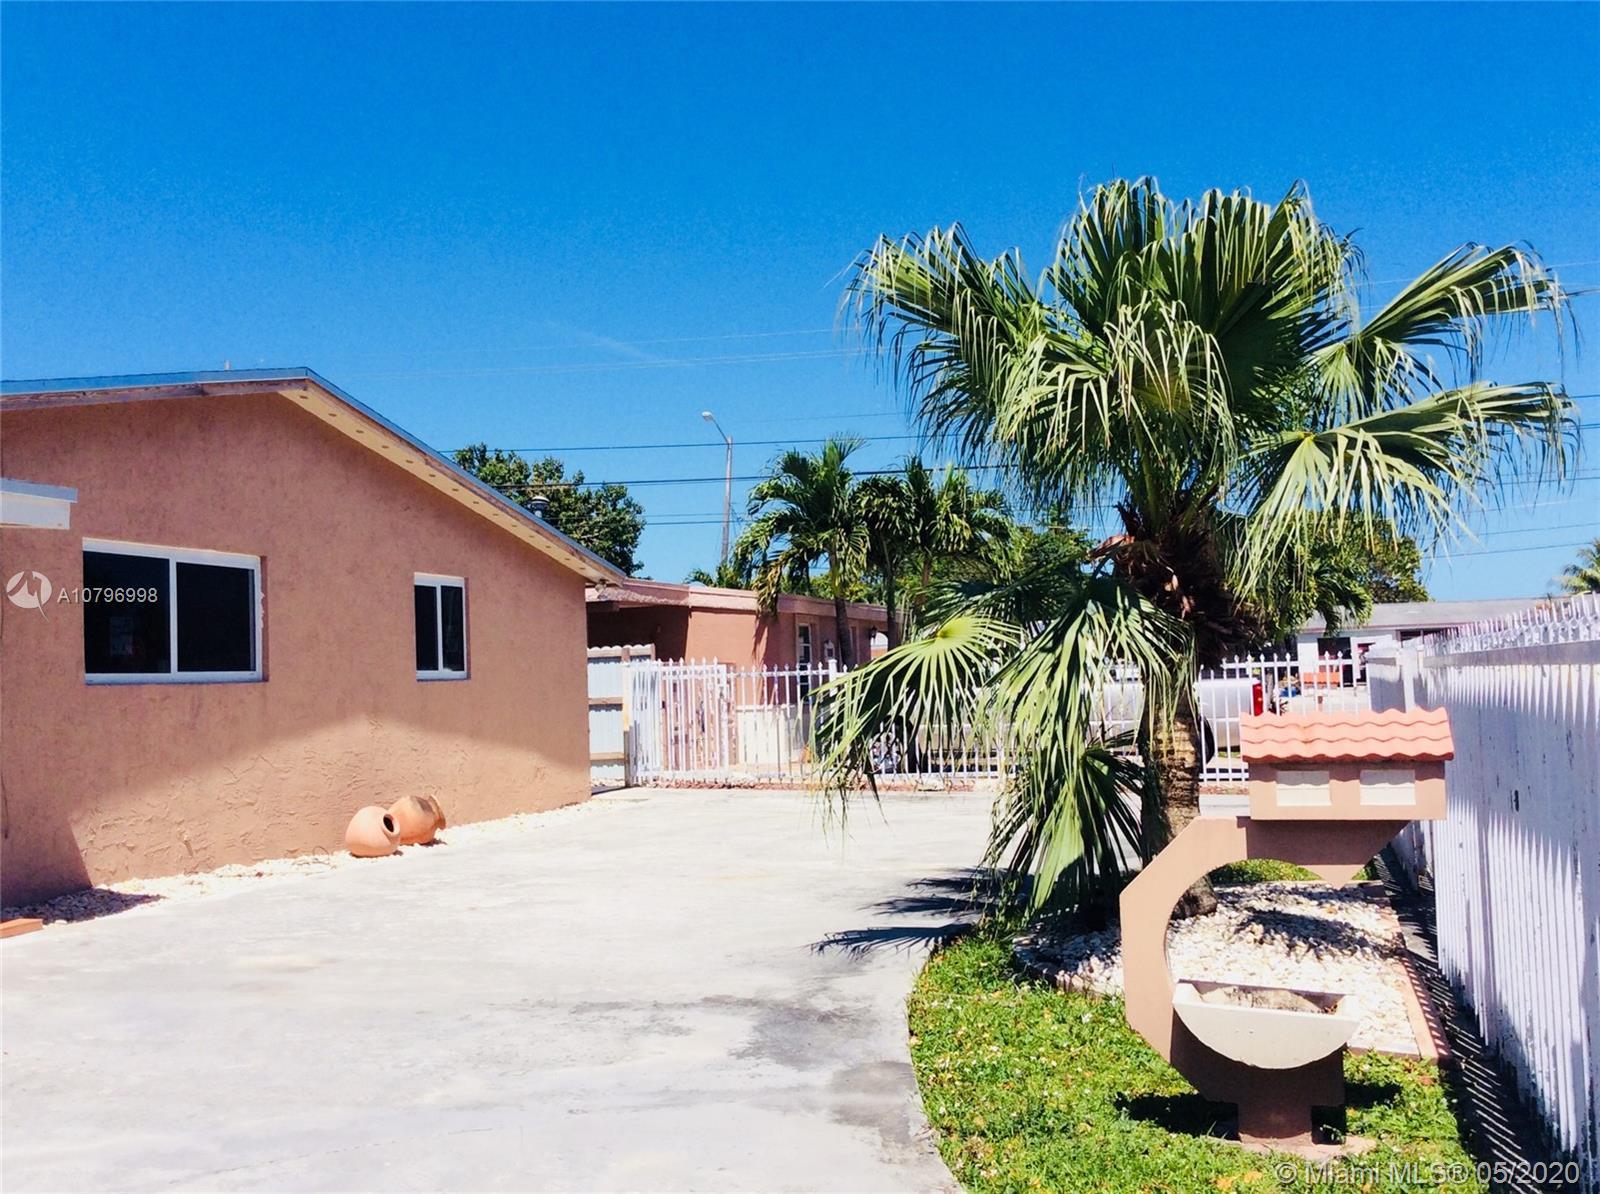 1211 W 62nd St - Hialeah, Florida